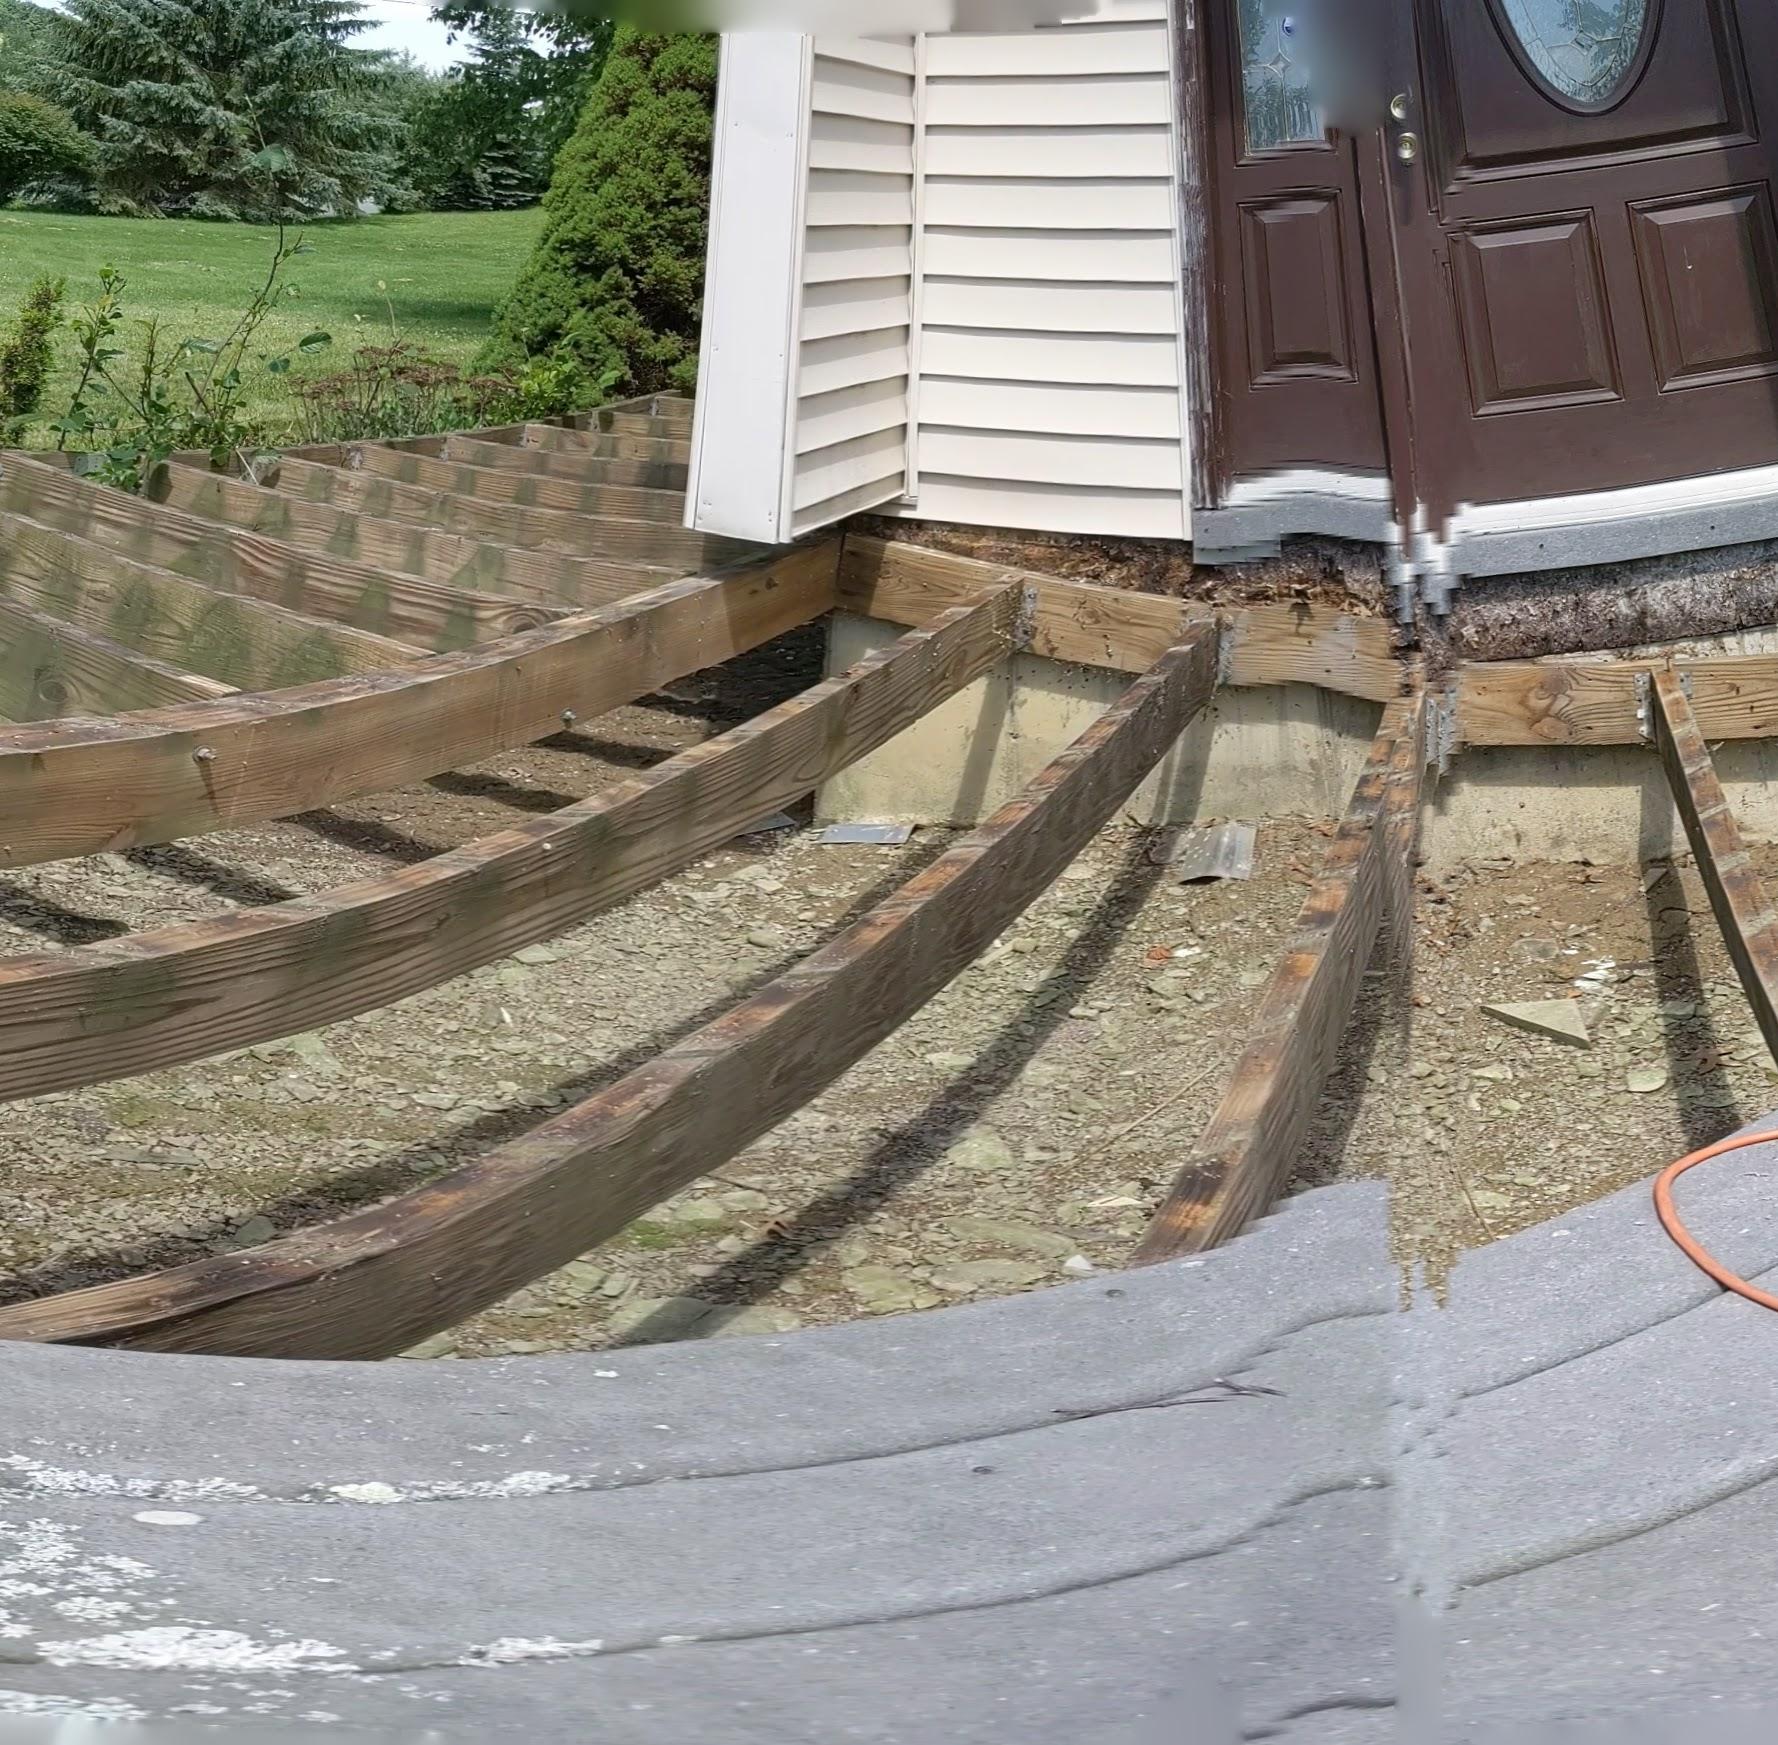 Front porch rebuild-pano_20200703_114043_1593819082361.vr.jpg